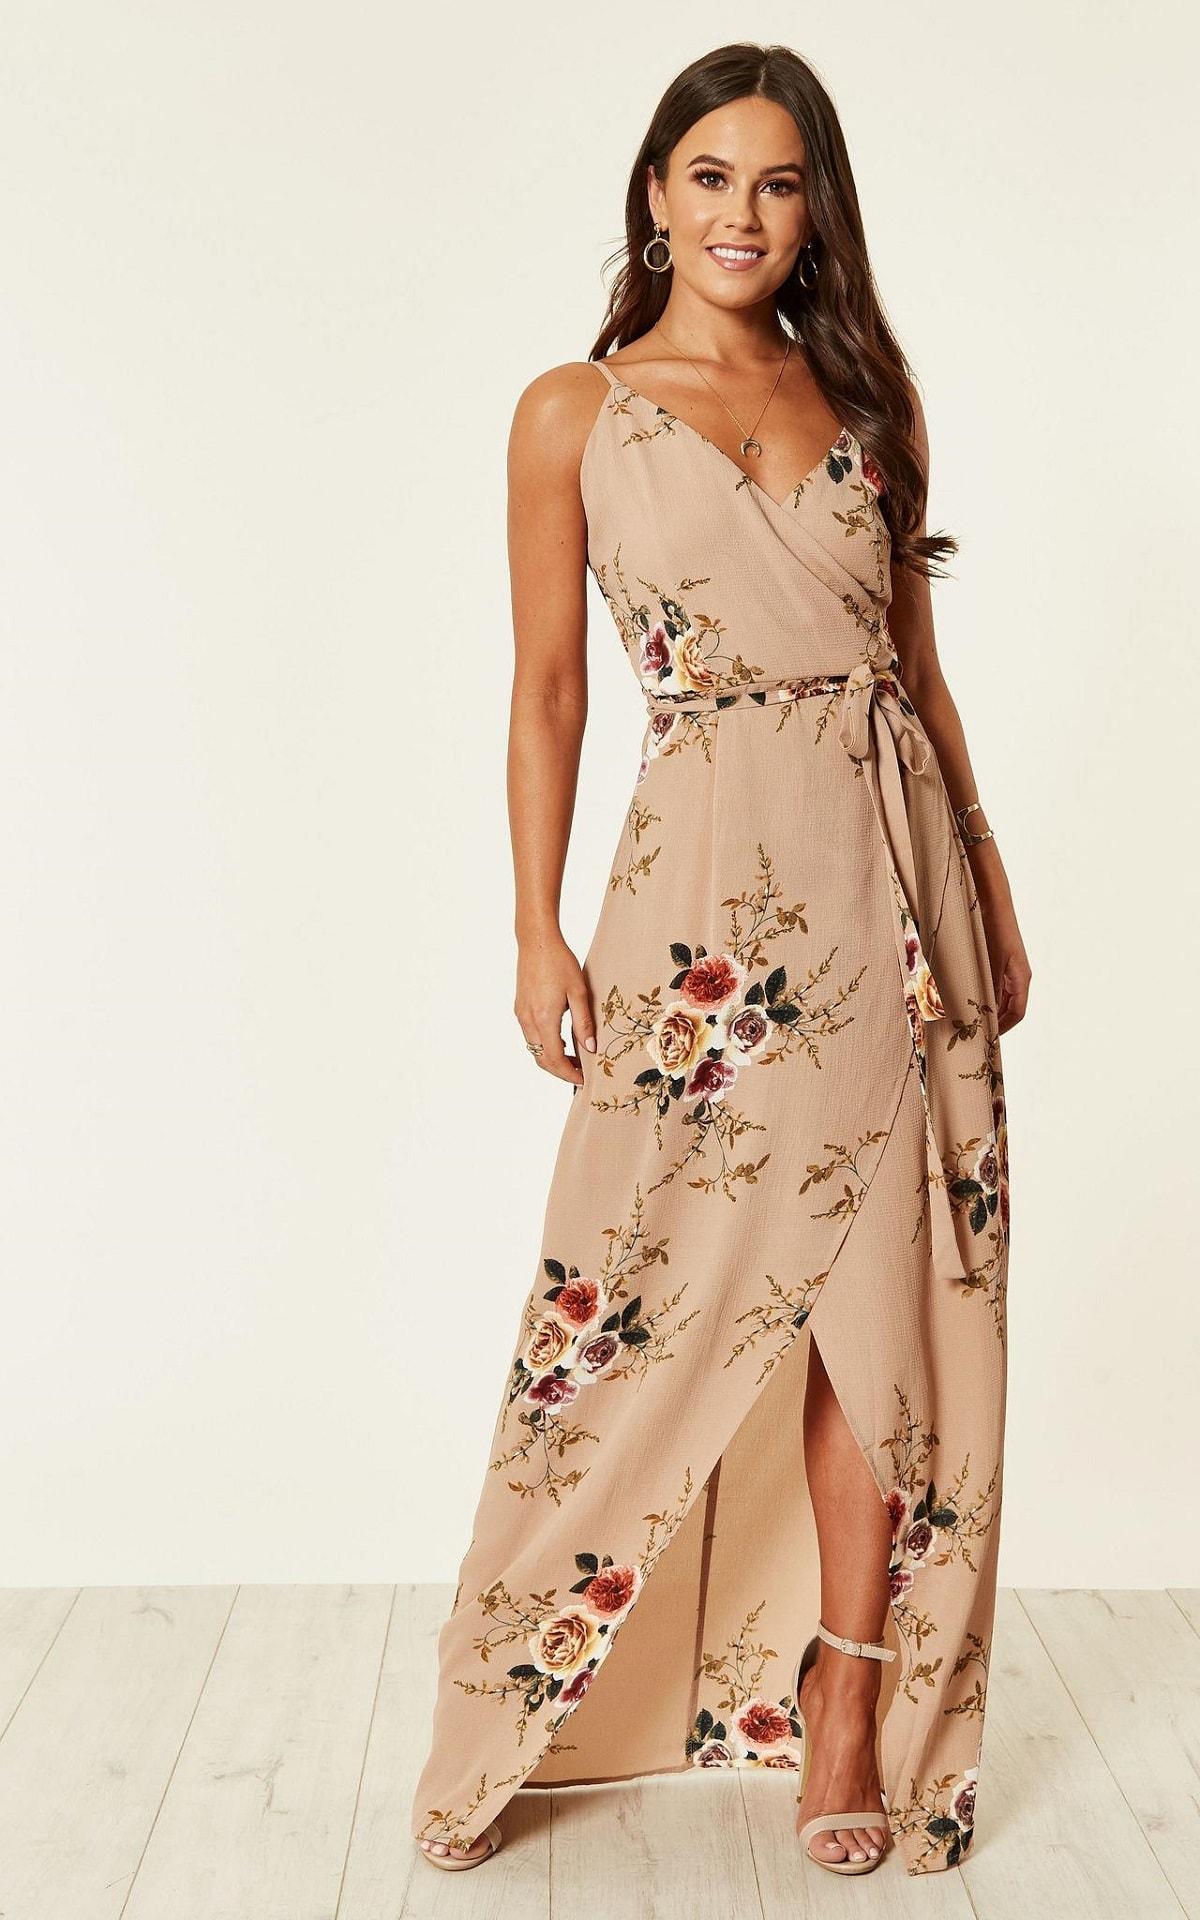 Destination Wedding Guest Styles - Floral Maxi Dress